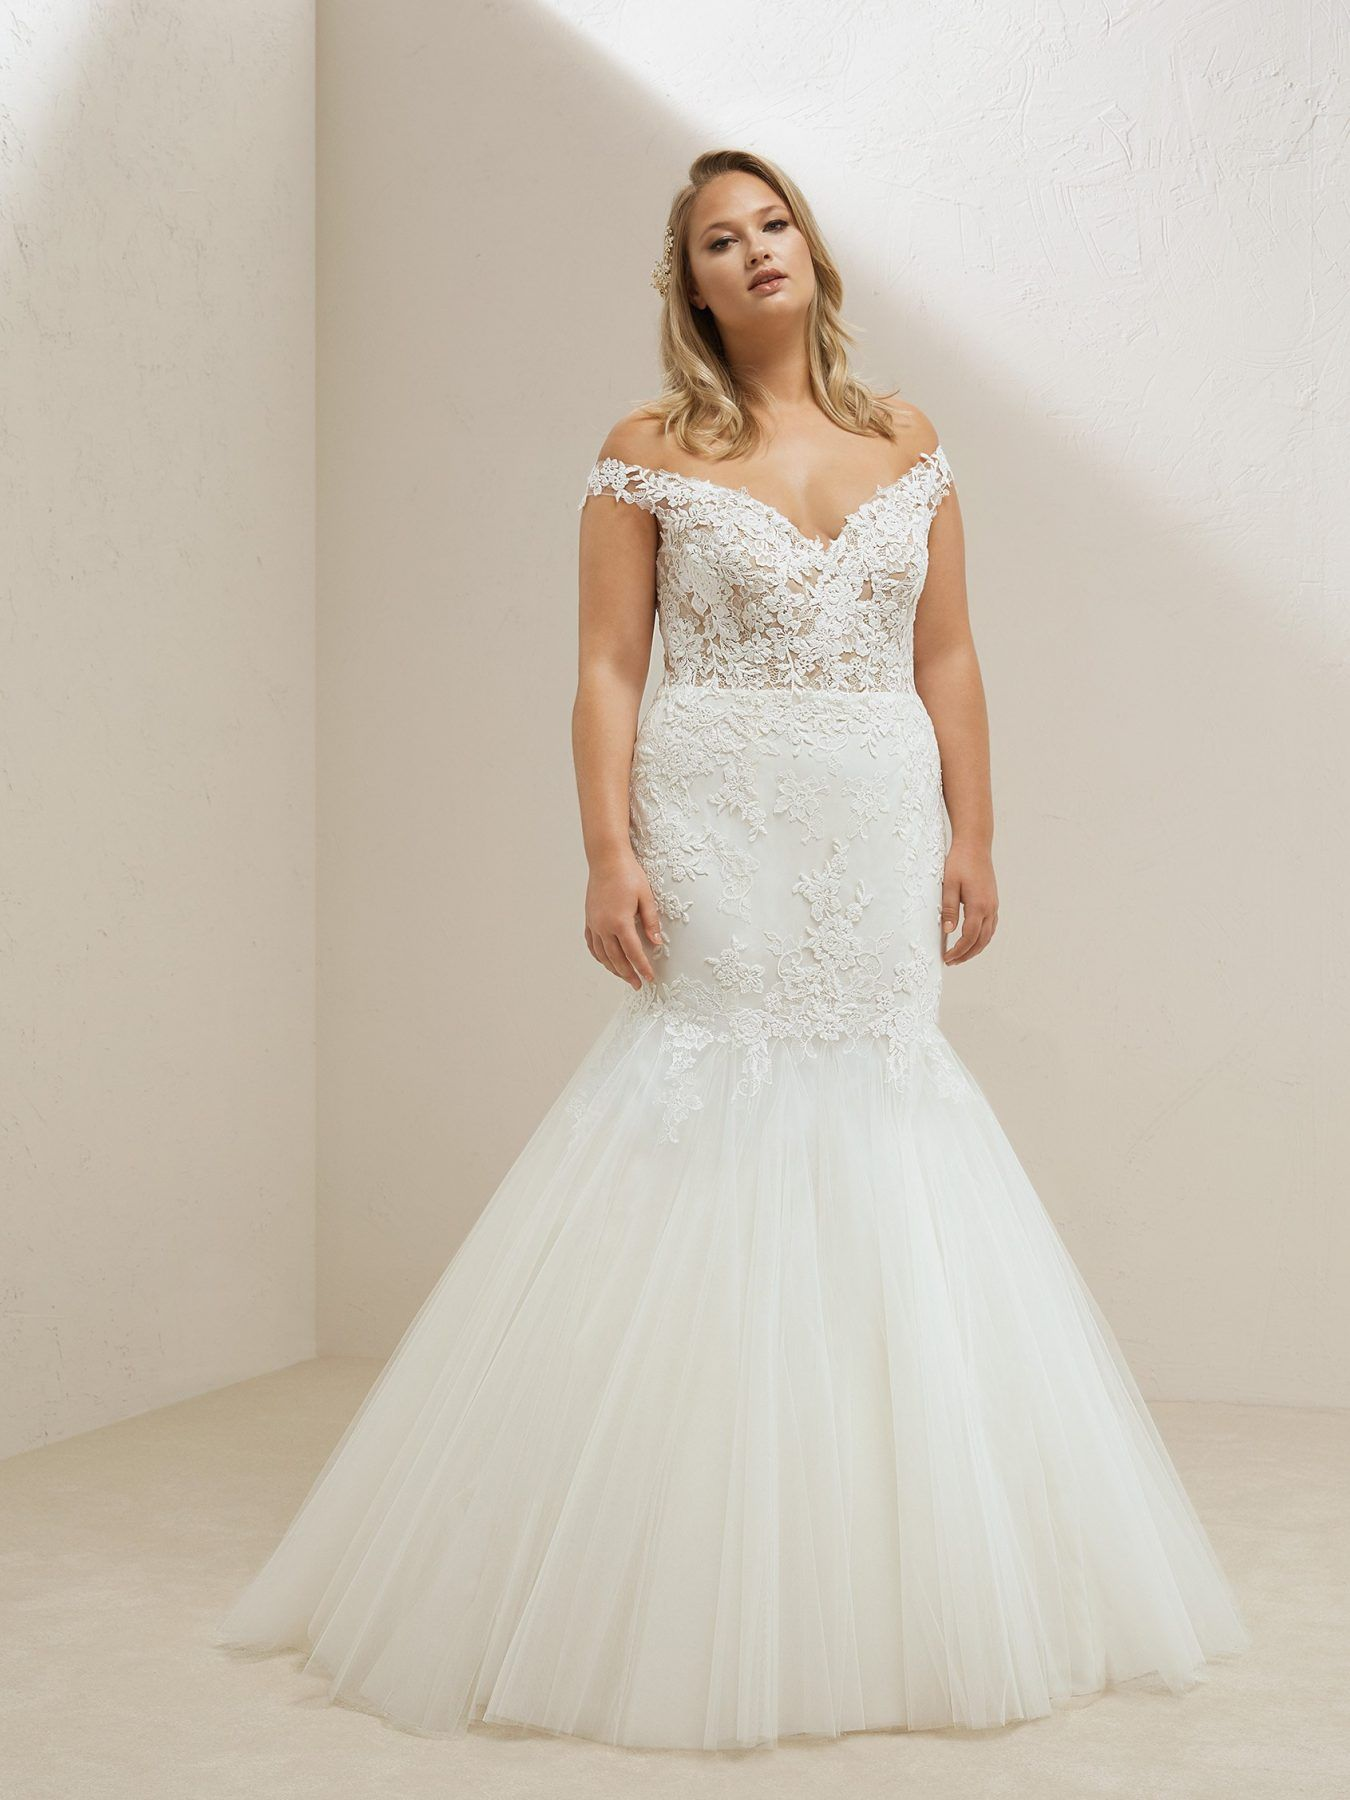 d2d54939cdac8 Lace bodice tulle skirt plus size mermaid wedding dress ...